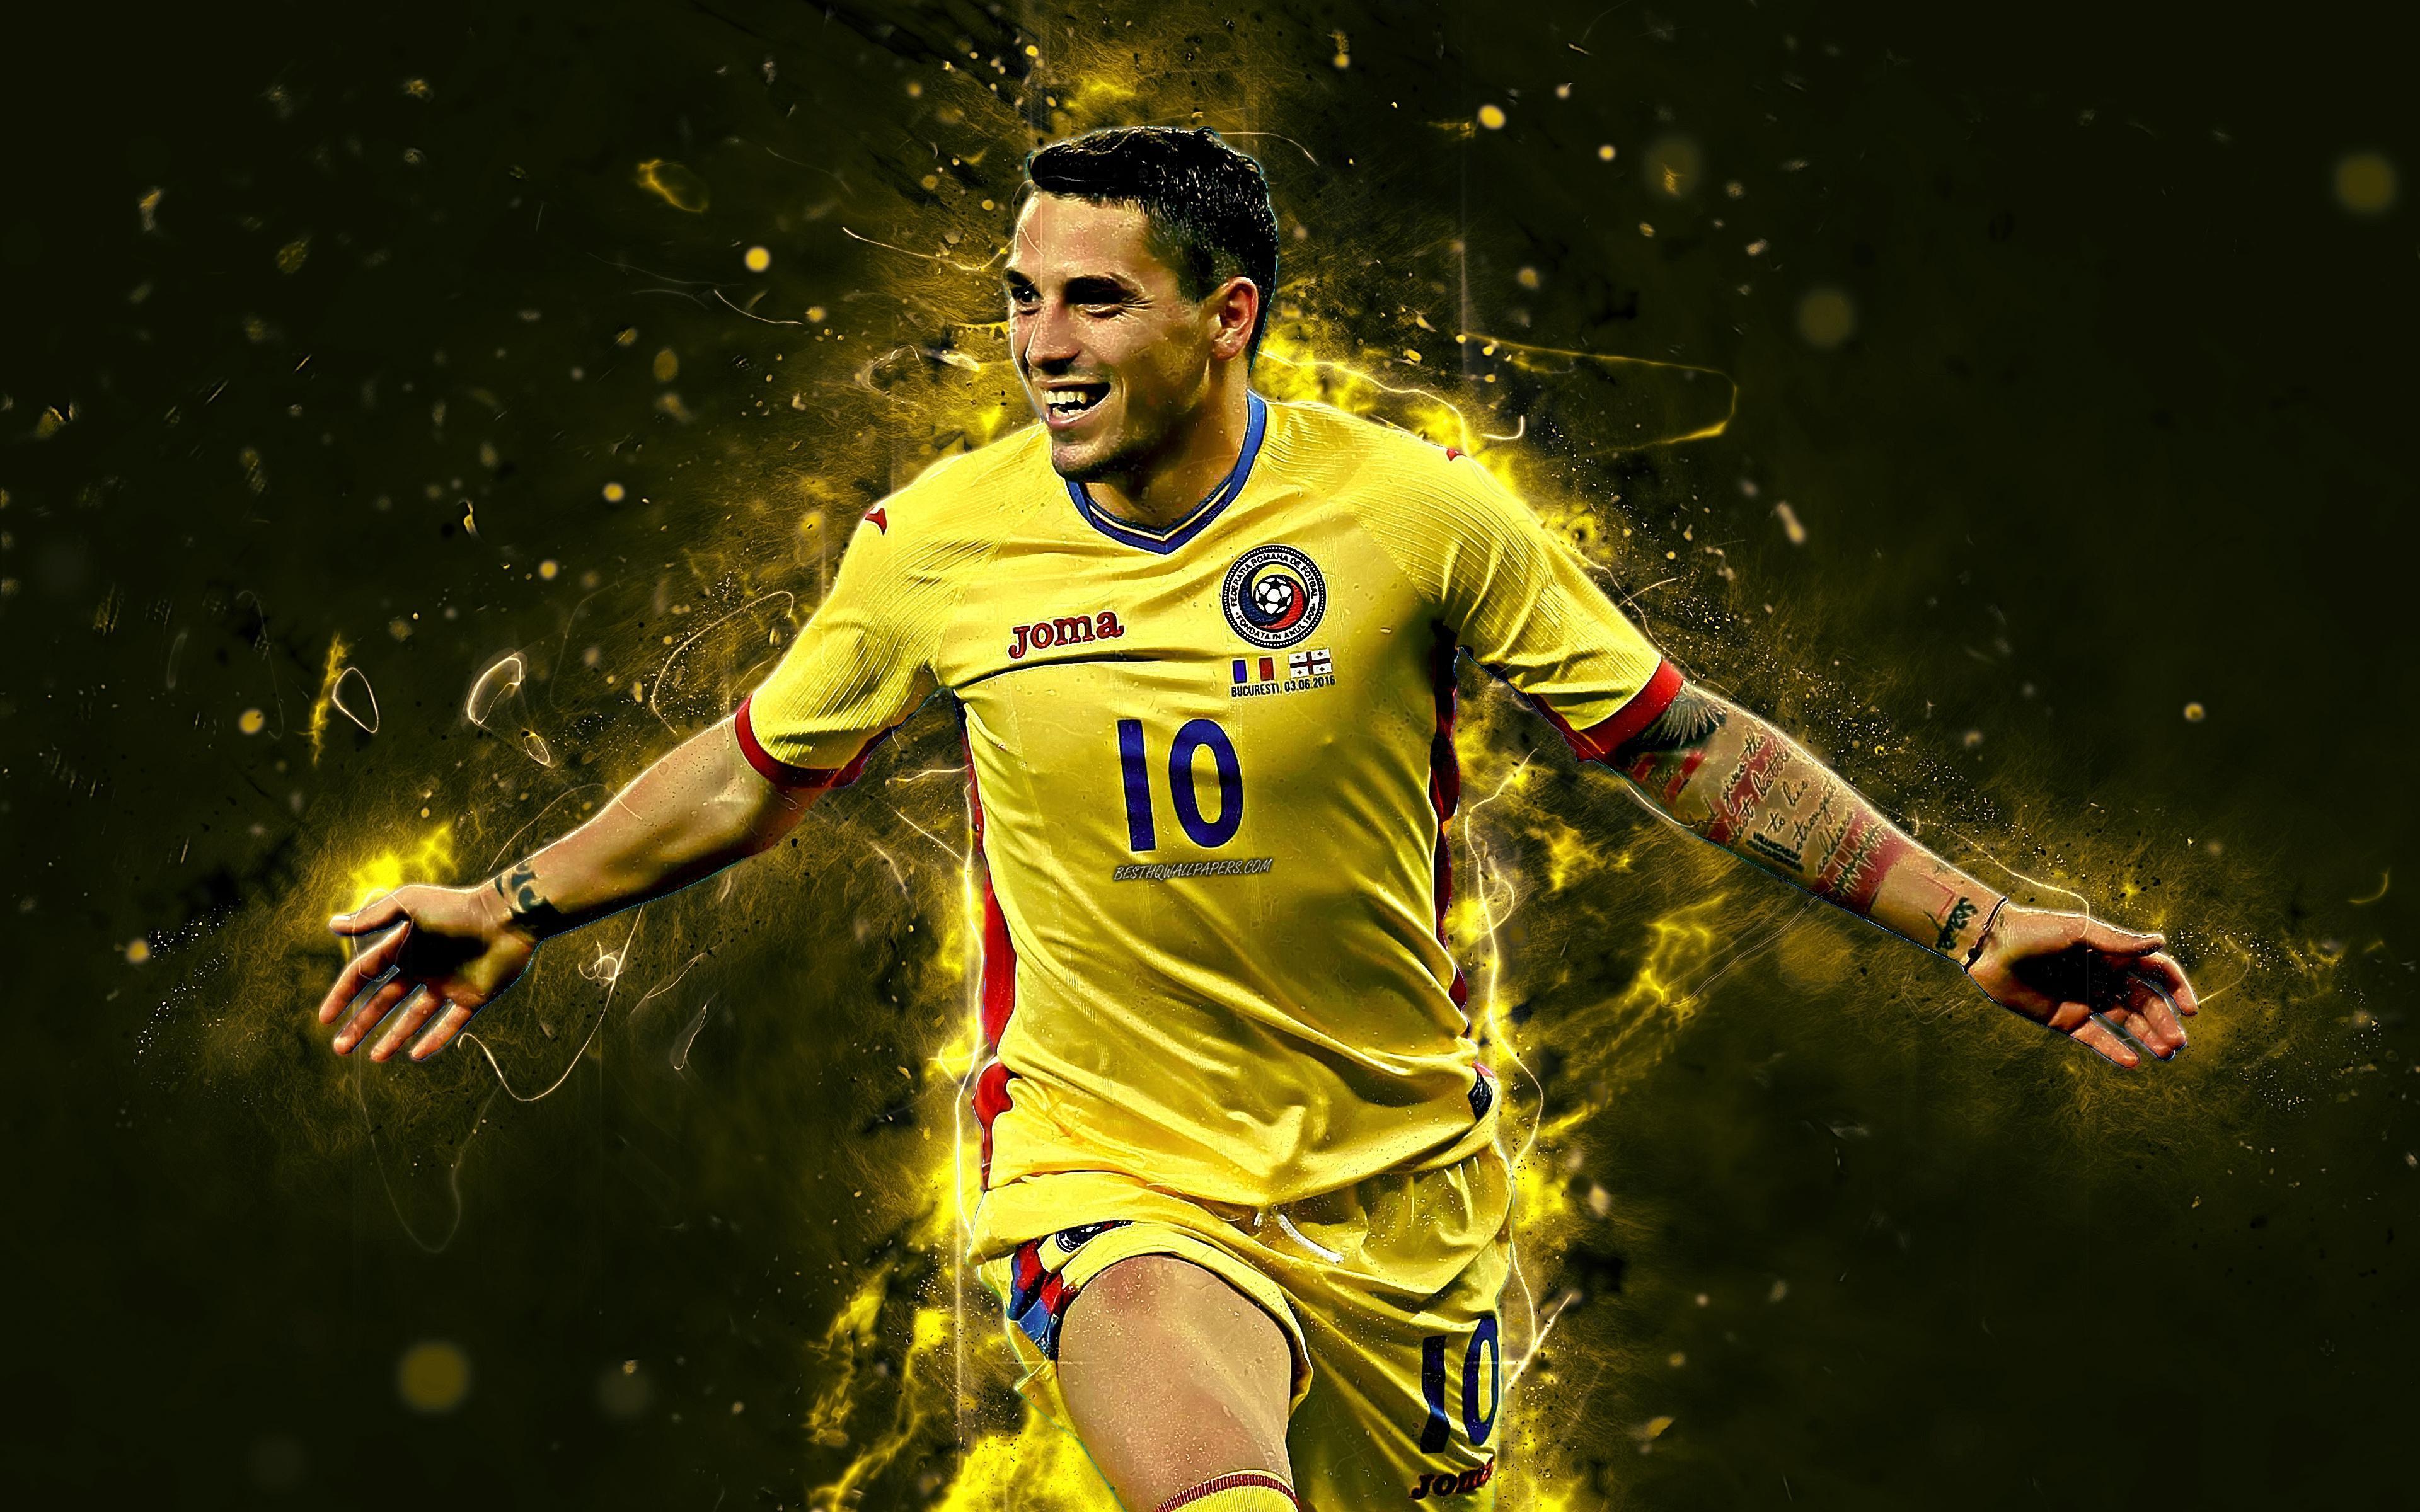 Romania National Football Team Backgrounds 9